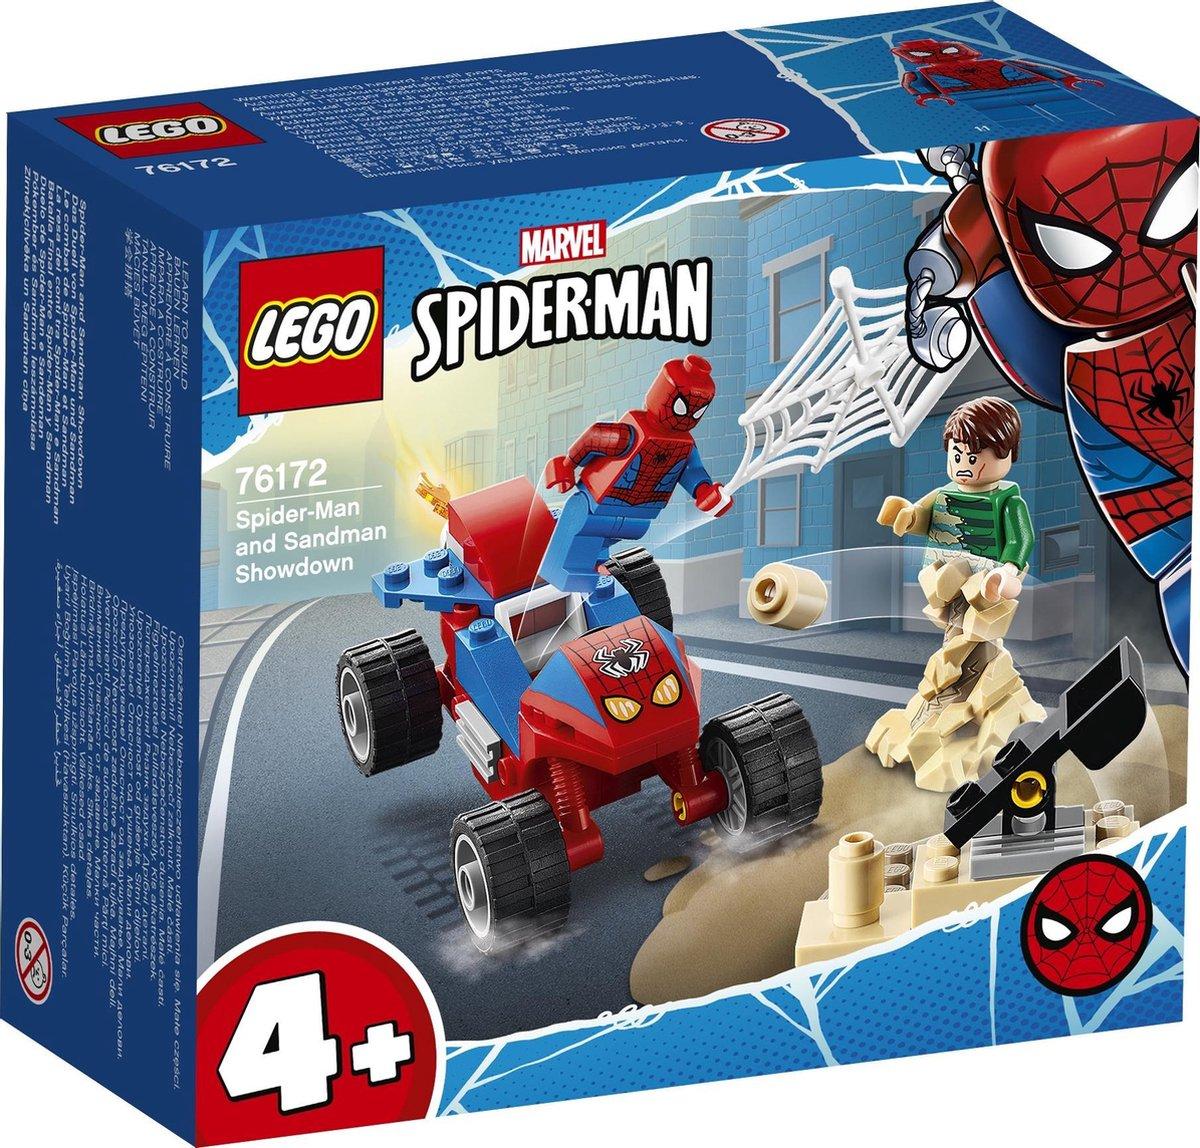 LEGO 4+ Spider-Man en Sandman Duel - 76172